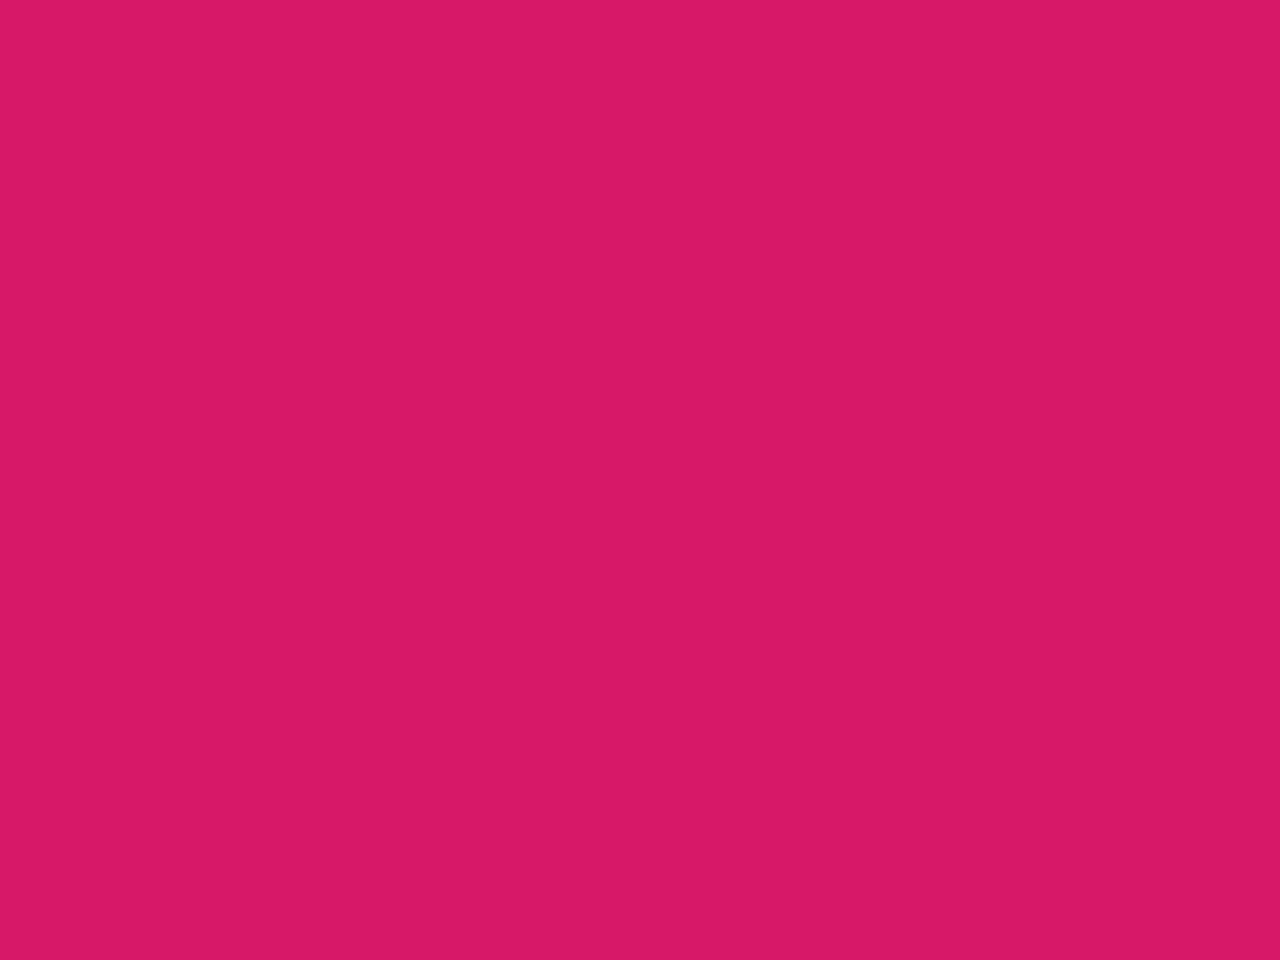 1280x960 Dogwood Rose Solid Color Background